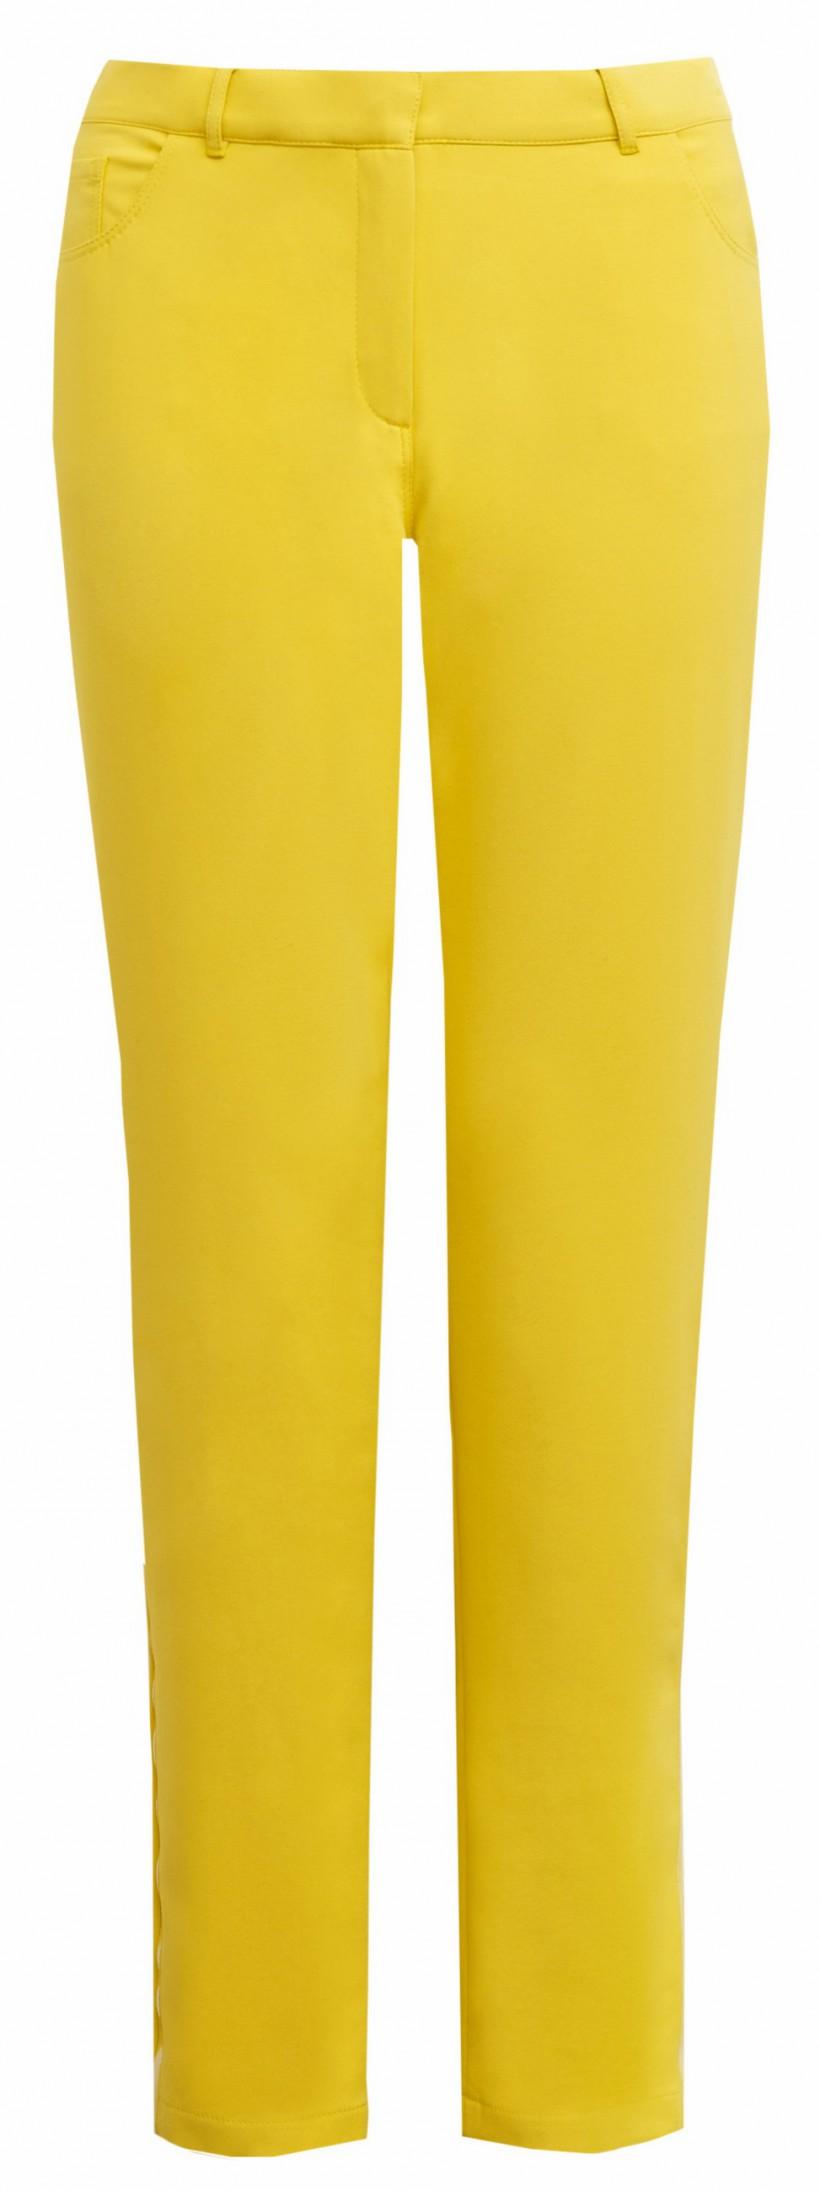 Spodnie z lampasami